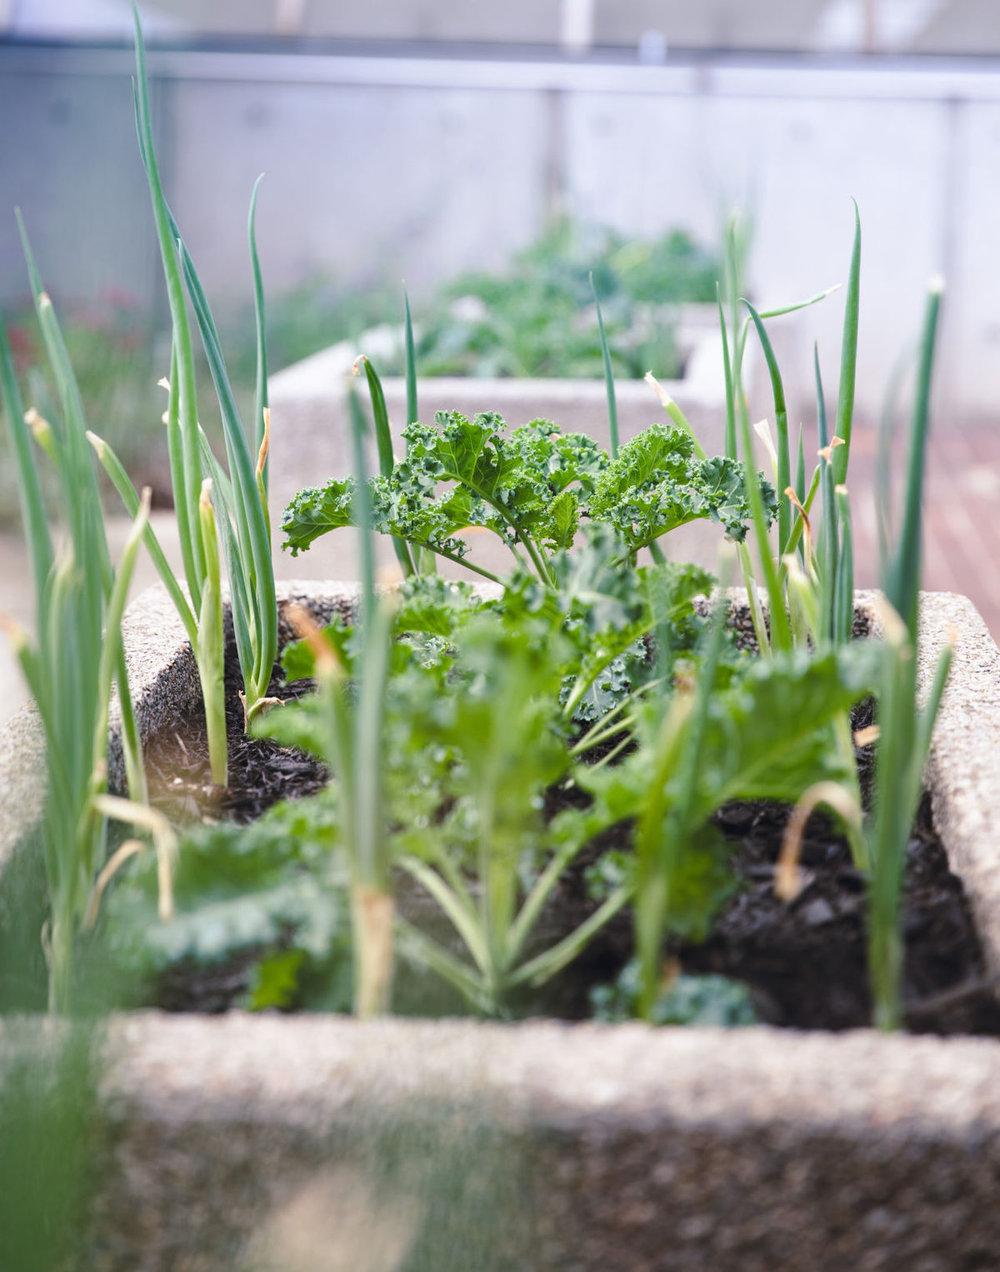 Kale grows in Enviro Western's outdoor food garden, photographed on Sept. 6, 2017.